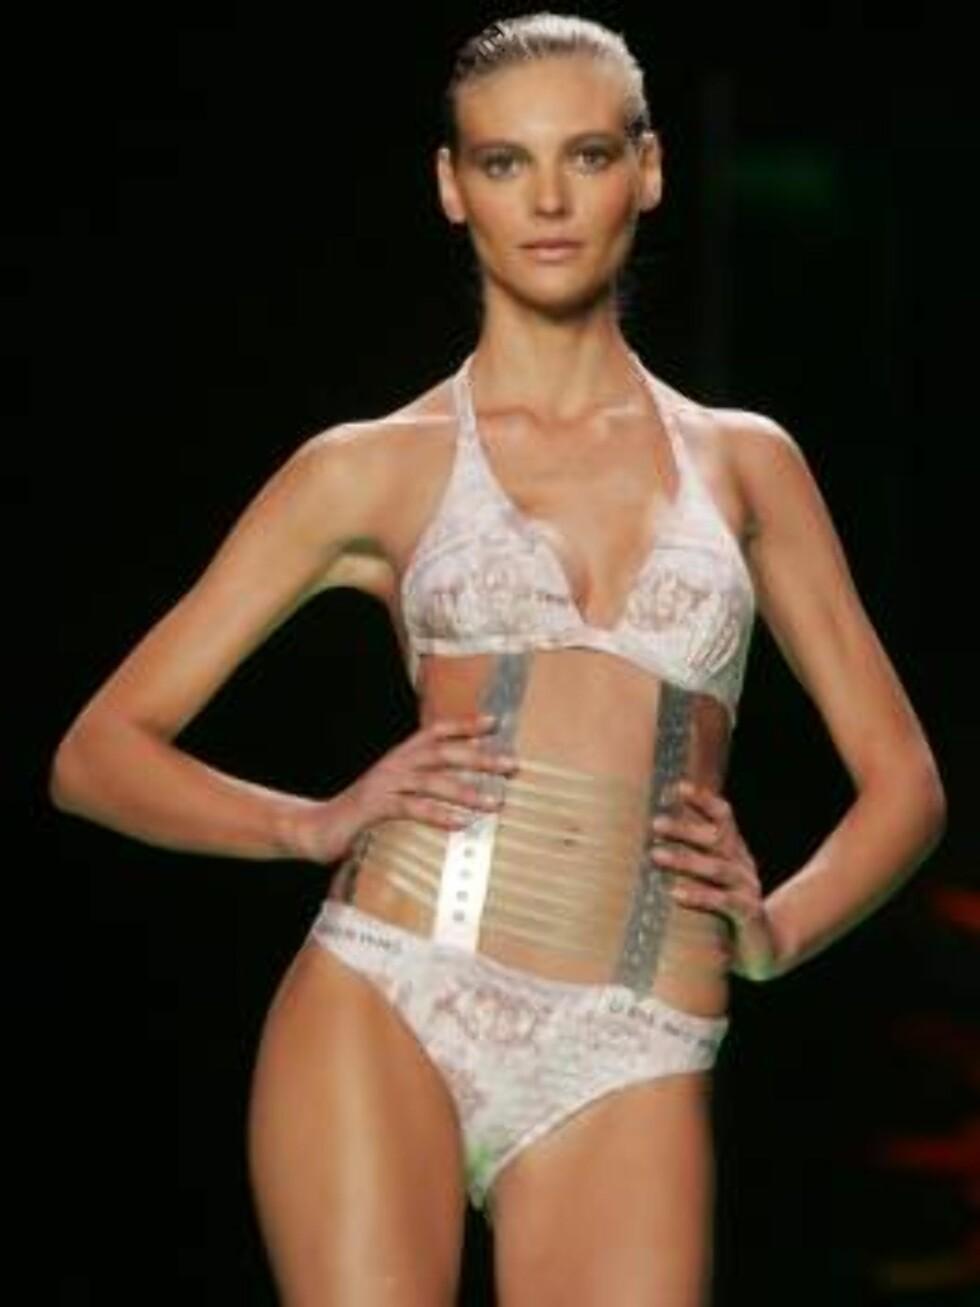 New YOrk 2006-09-10   A model walks the runway at ROSA CHA Spring/Summer 2007 Fashion Show during Olympus Fashion Week.  Photo: Nancy Kaszerman/ZUMA Press  Code: 4014  COPYRIGHT STELLA PICTURES Foto: STELLA PICTURES